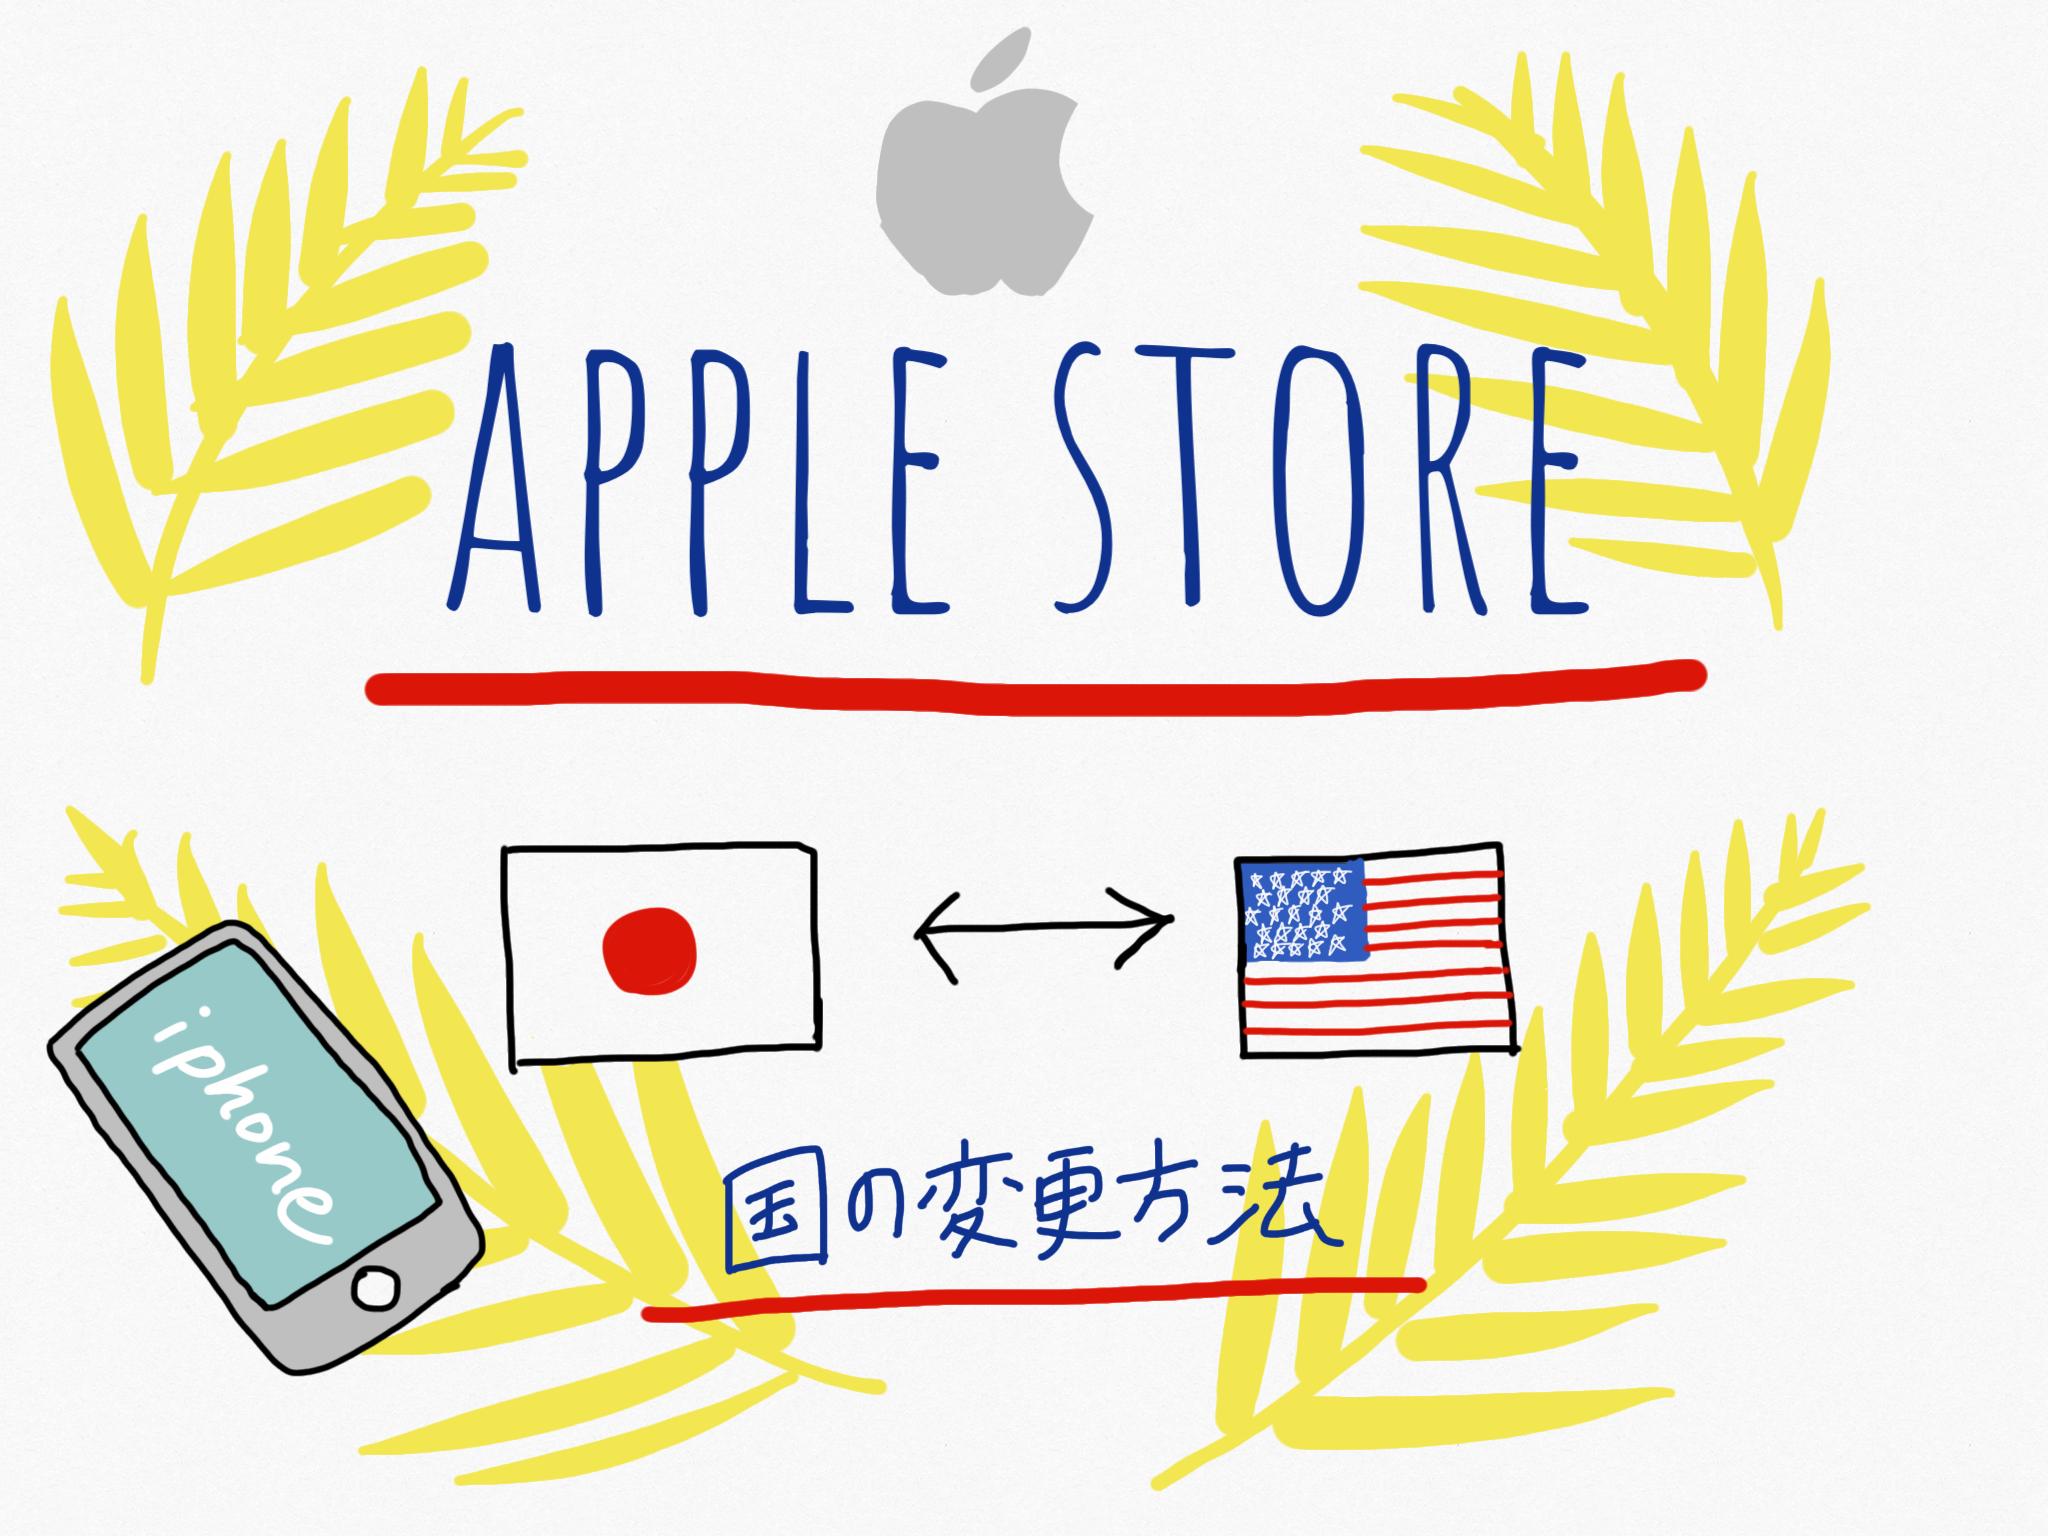 iPhoneの設定を変更してアメリカ限定アプリをインストールしよう